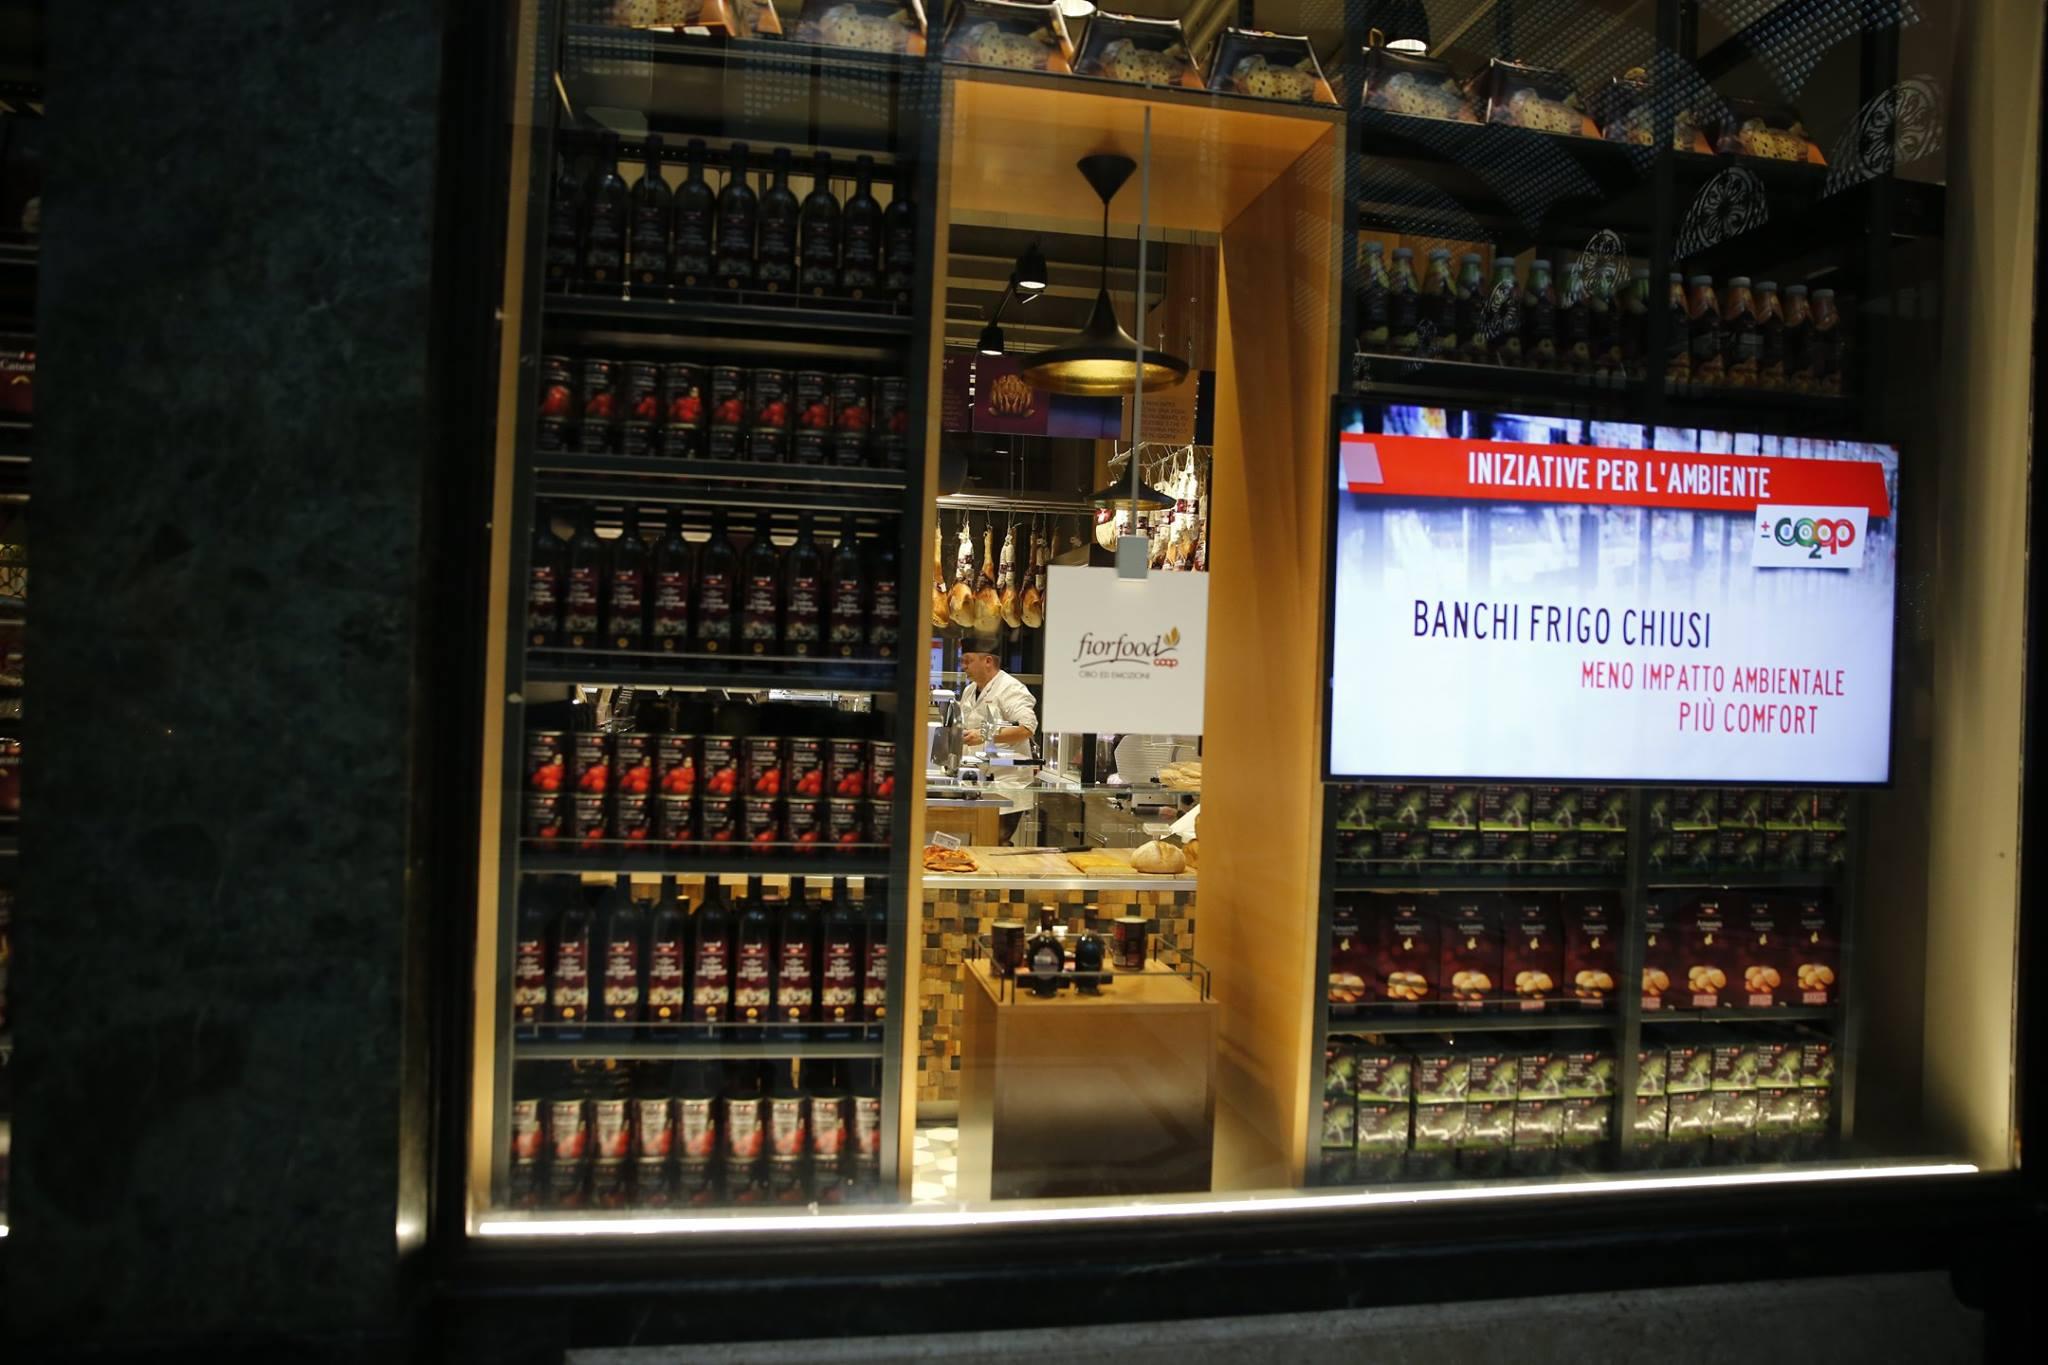 La Credenza Galleria San Federico : Da fiorfood elegante concept store coop in galleria san federico